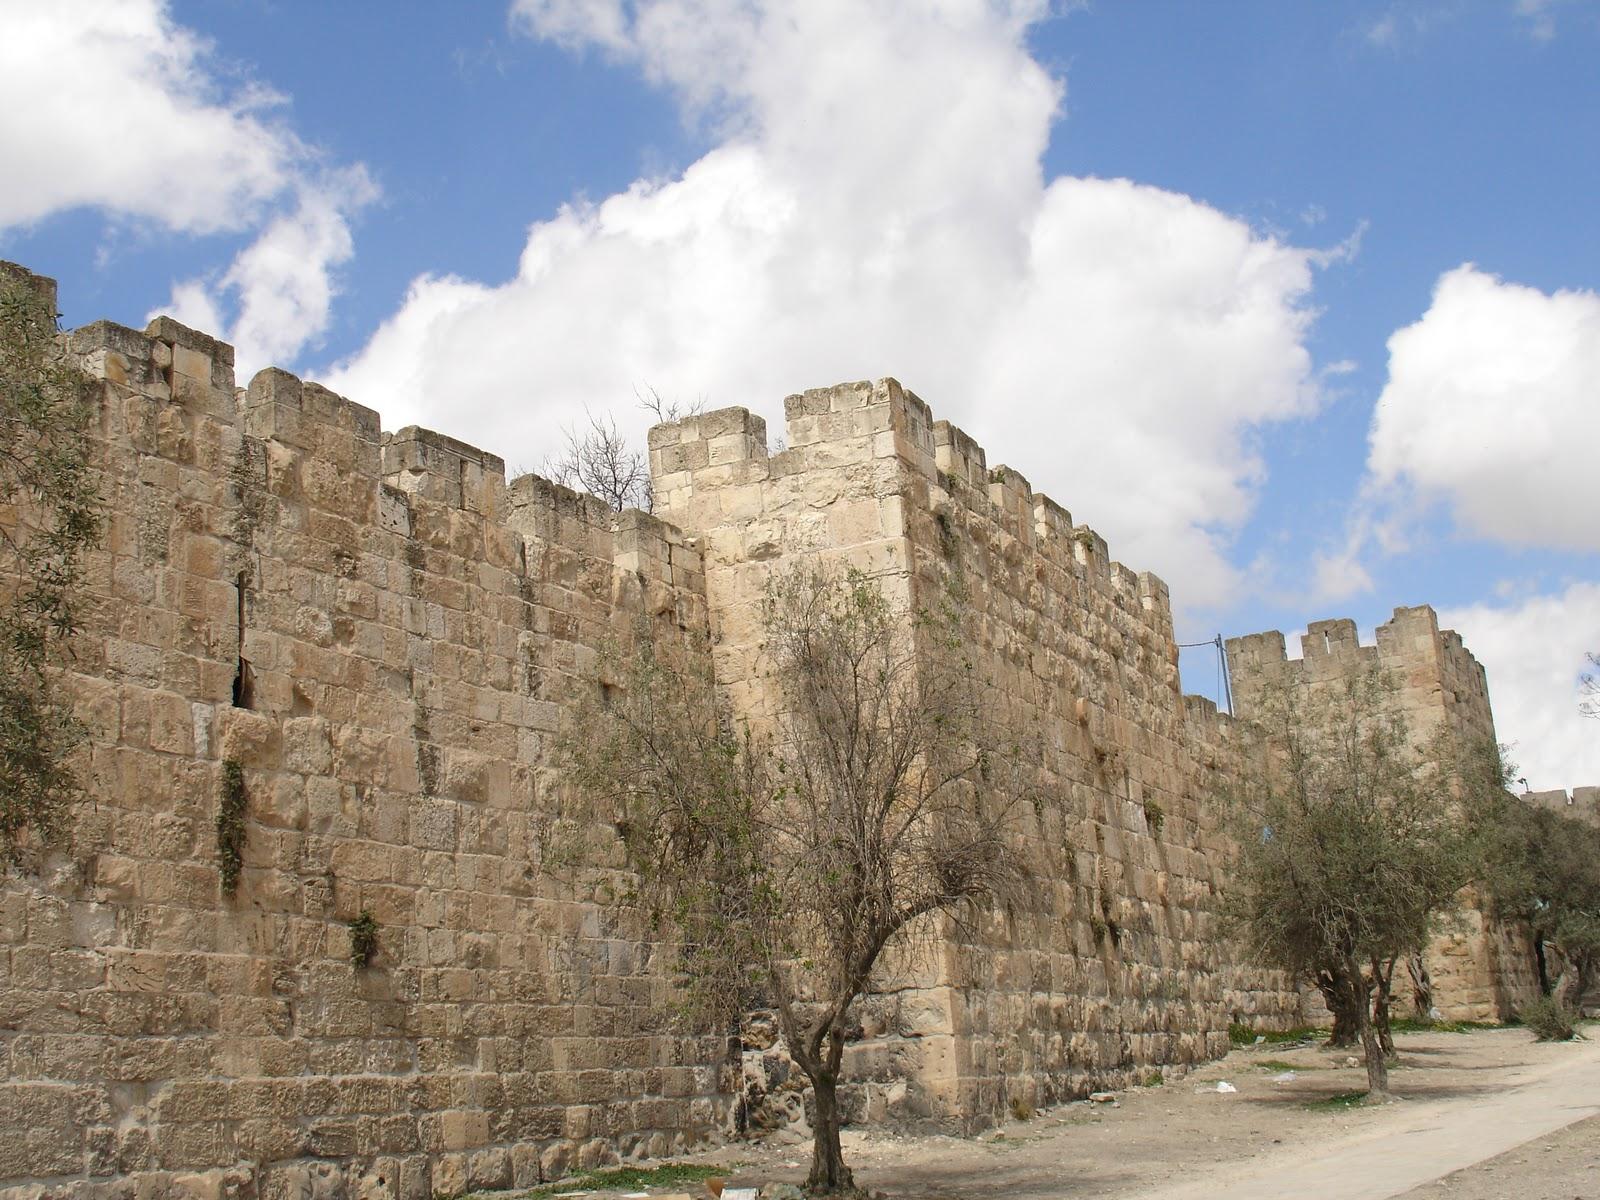 VI Lois concernant la lecture de la Méghilla selon le type de villes - Torath Hamoadim